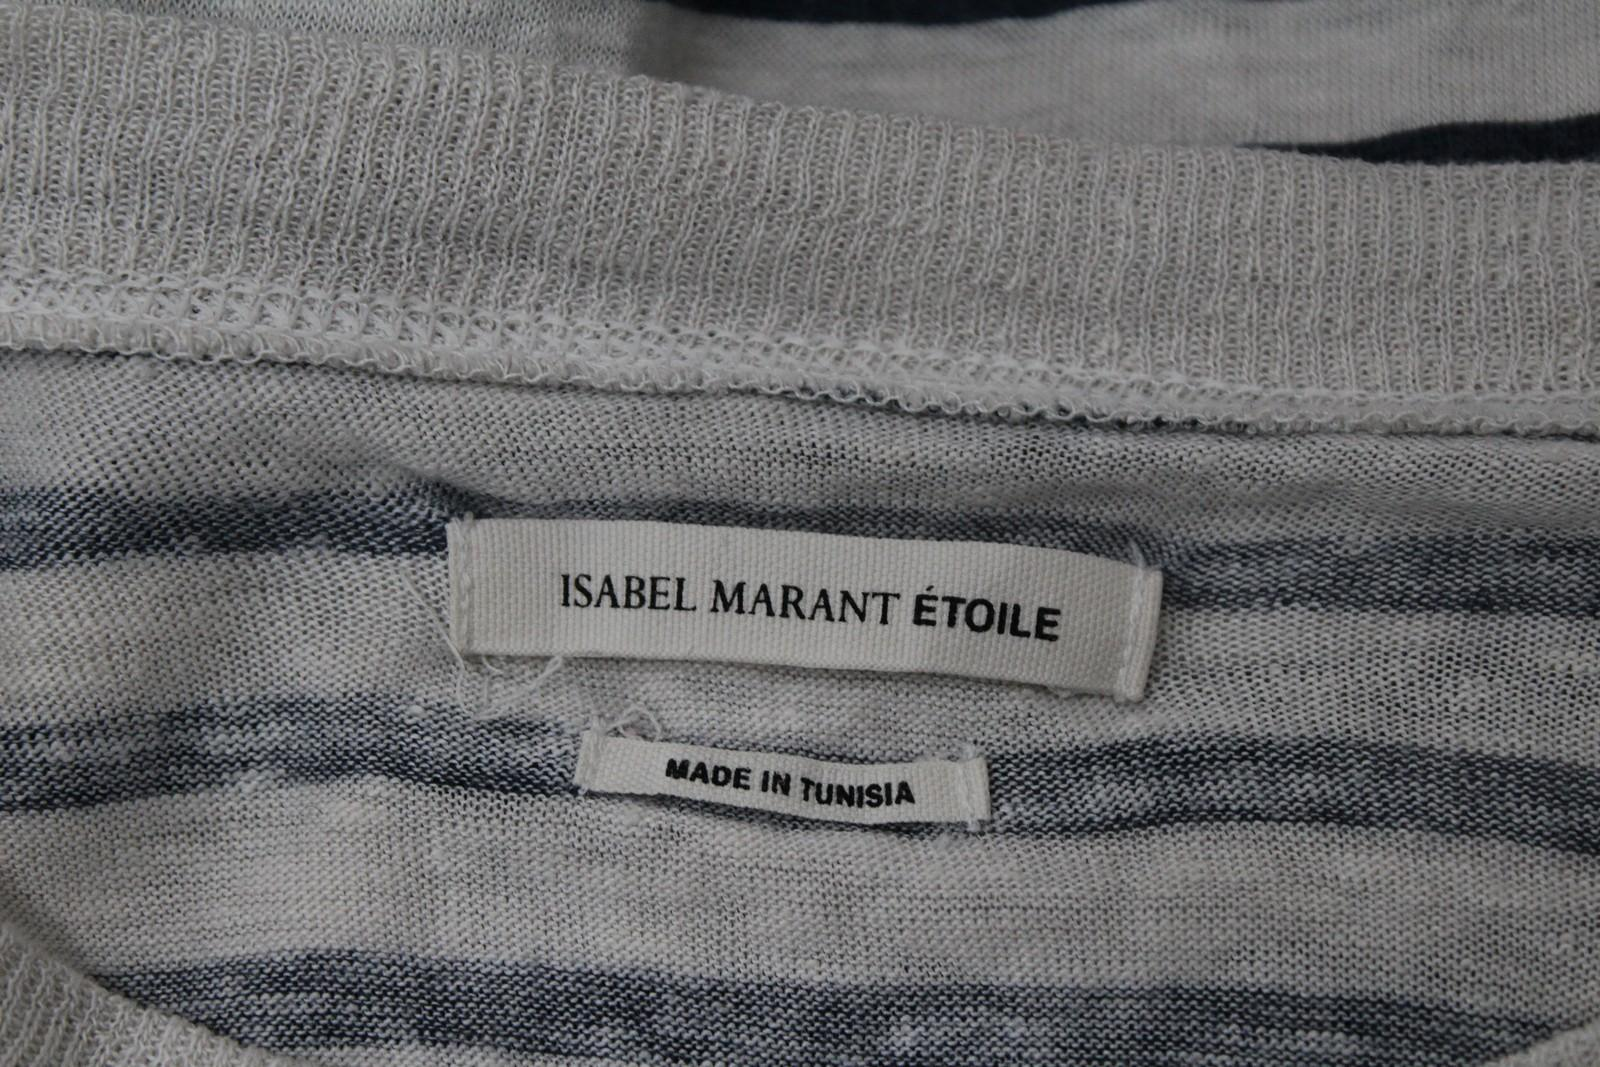 ISABEL-MARANT-ETOILE-Damas-Marfil-Lino-Mangas-Largas-Franjas-Dublin-1965-Top-S miniatura 8